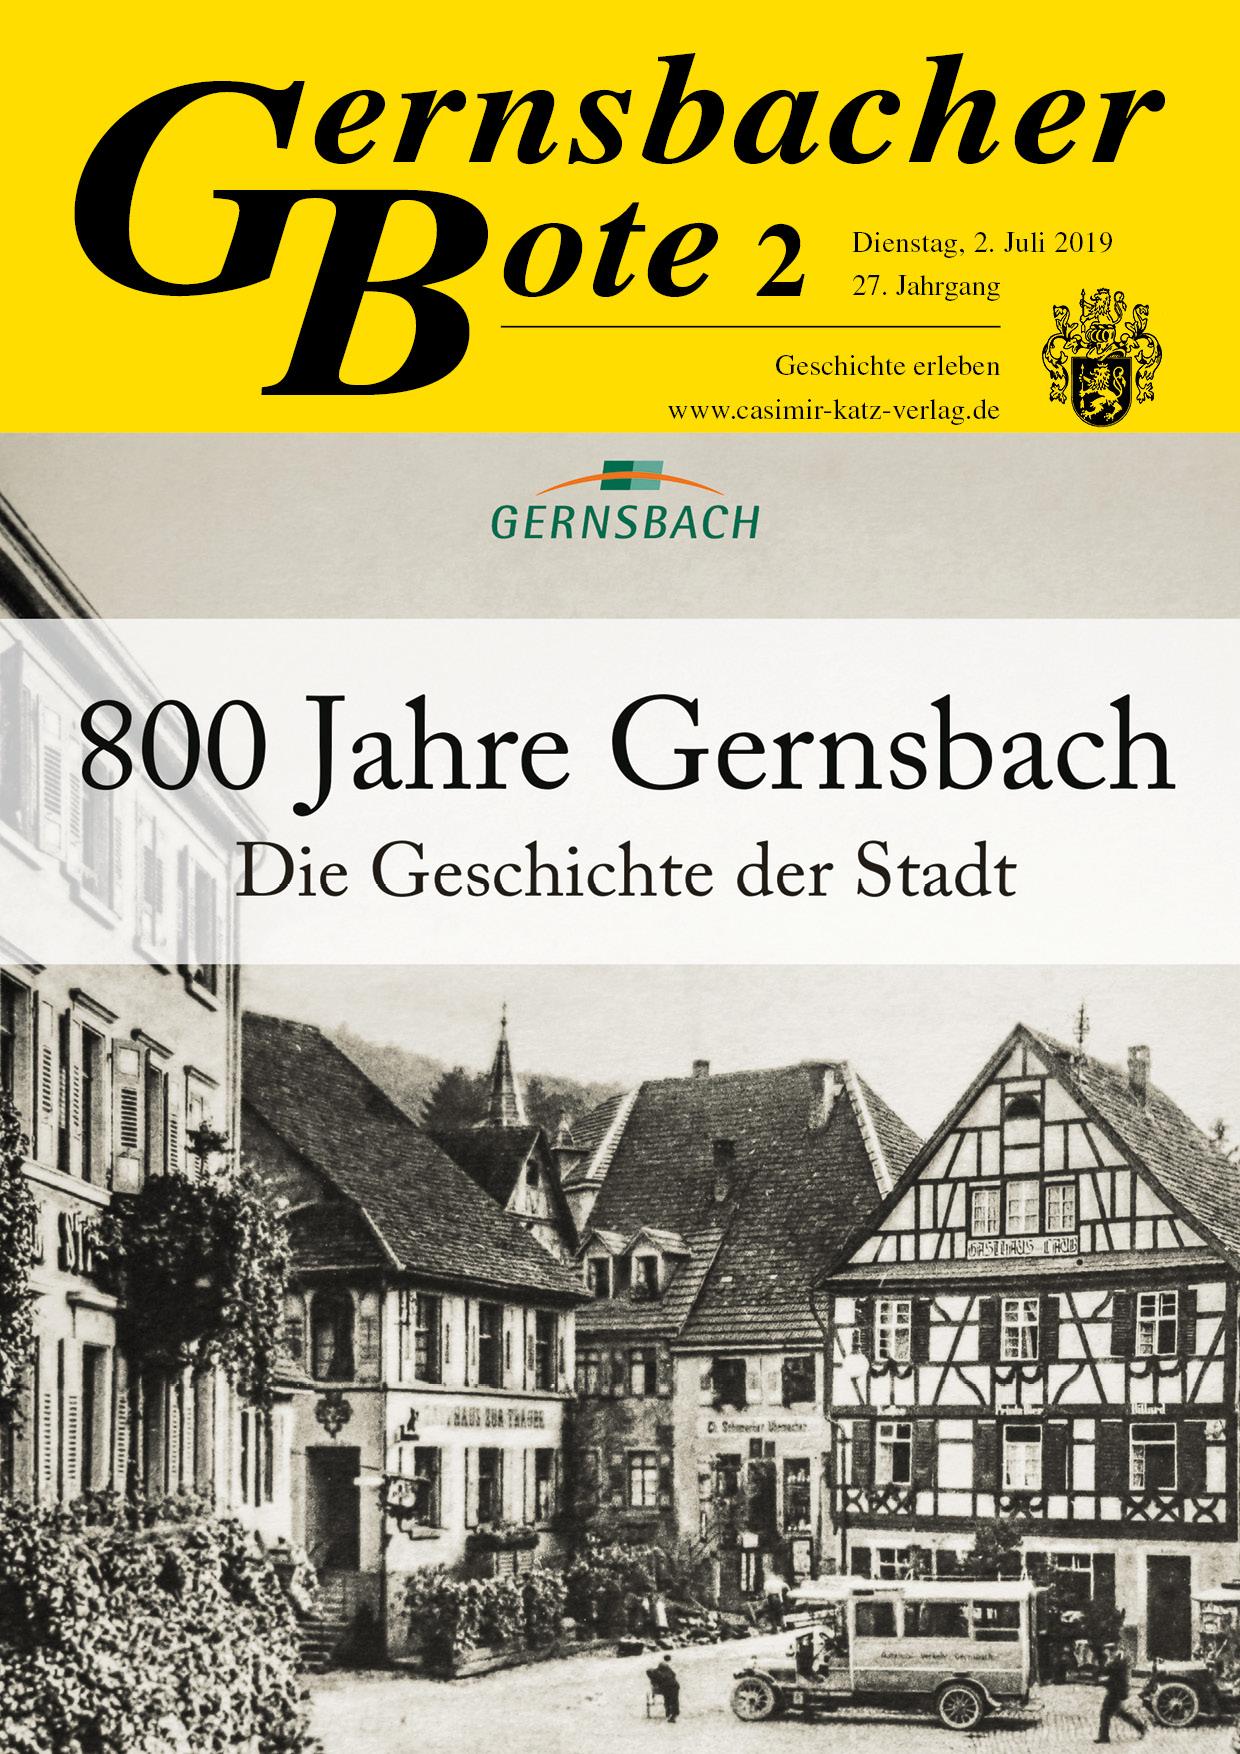 Gernsbacher Bote 03/2016